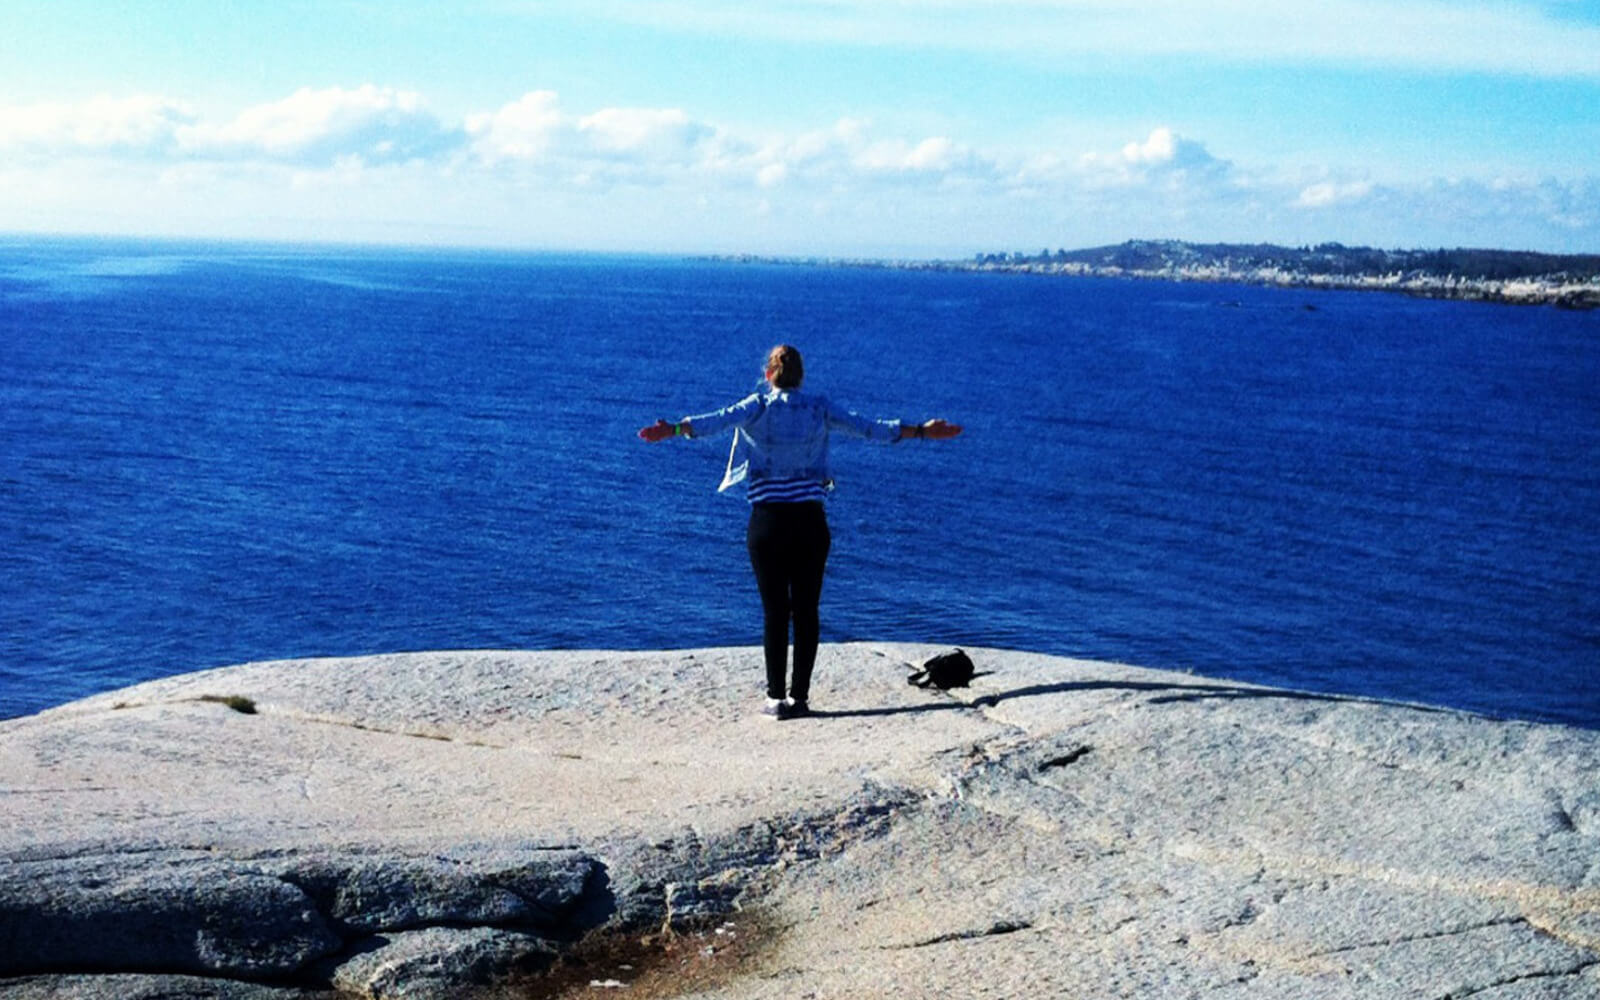 Lena am Meer